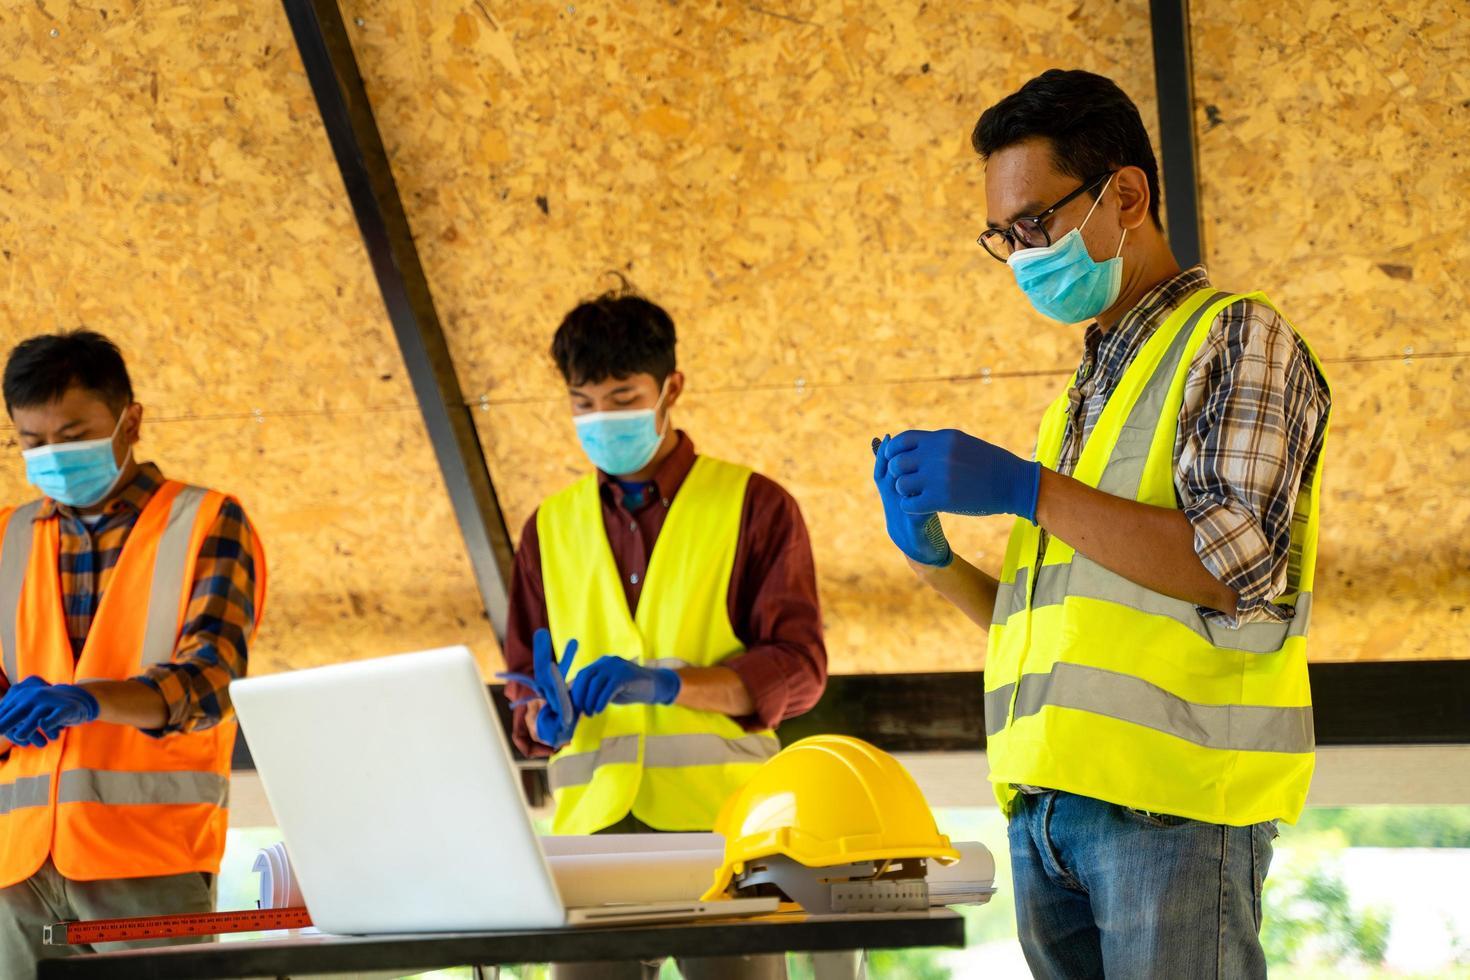 Men wearing protective face masks photo